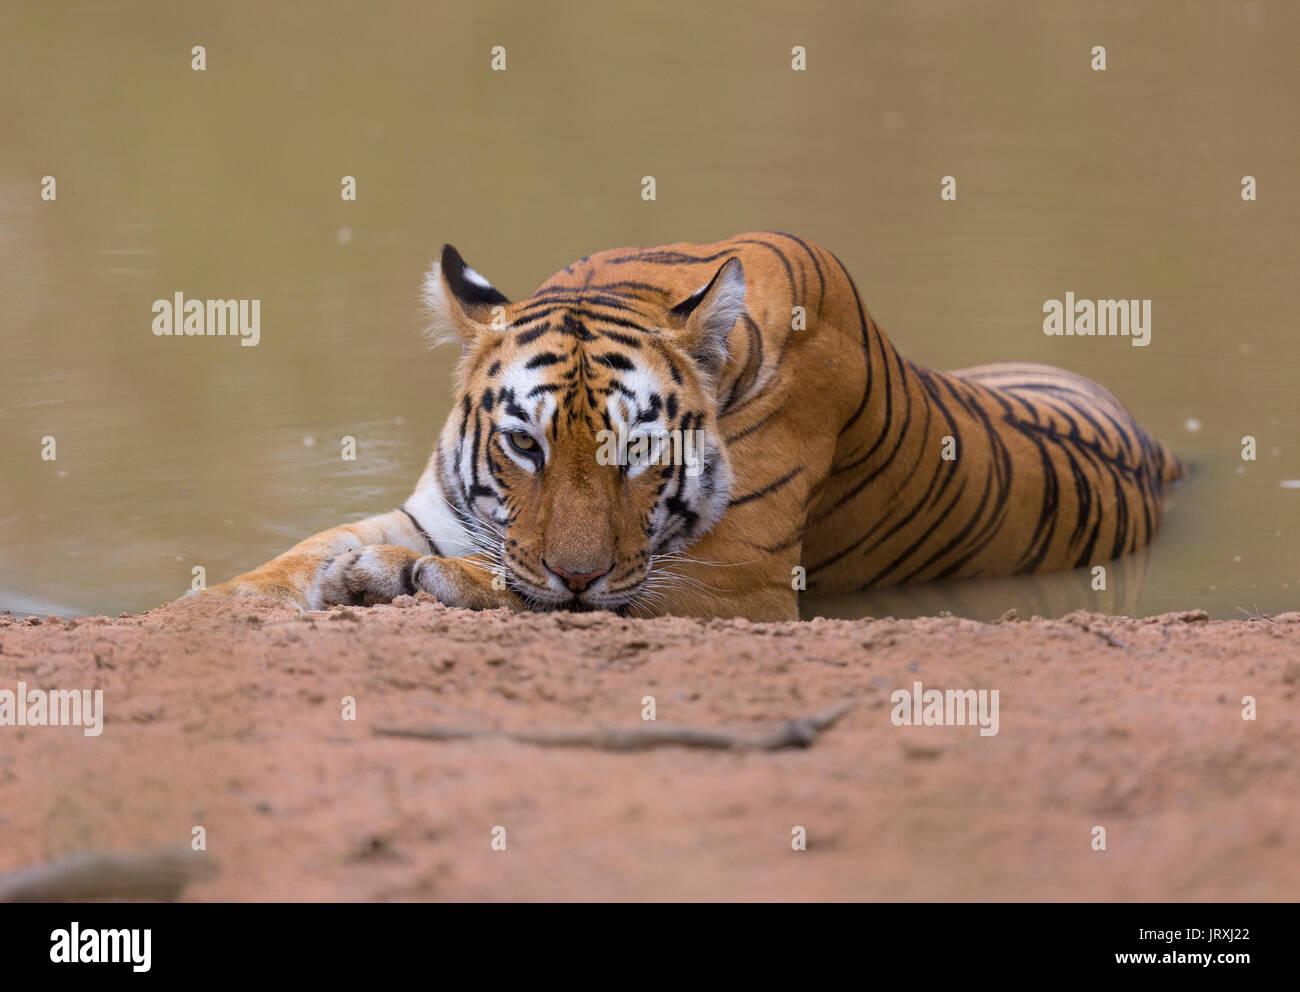 Royal tigre del Bengala o Panthera tigris tigris o Indian Tiger rilassante sull'acqua in Tadoba National Park, Maharashtra, India Immagini Stock